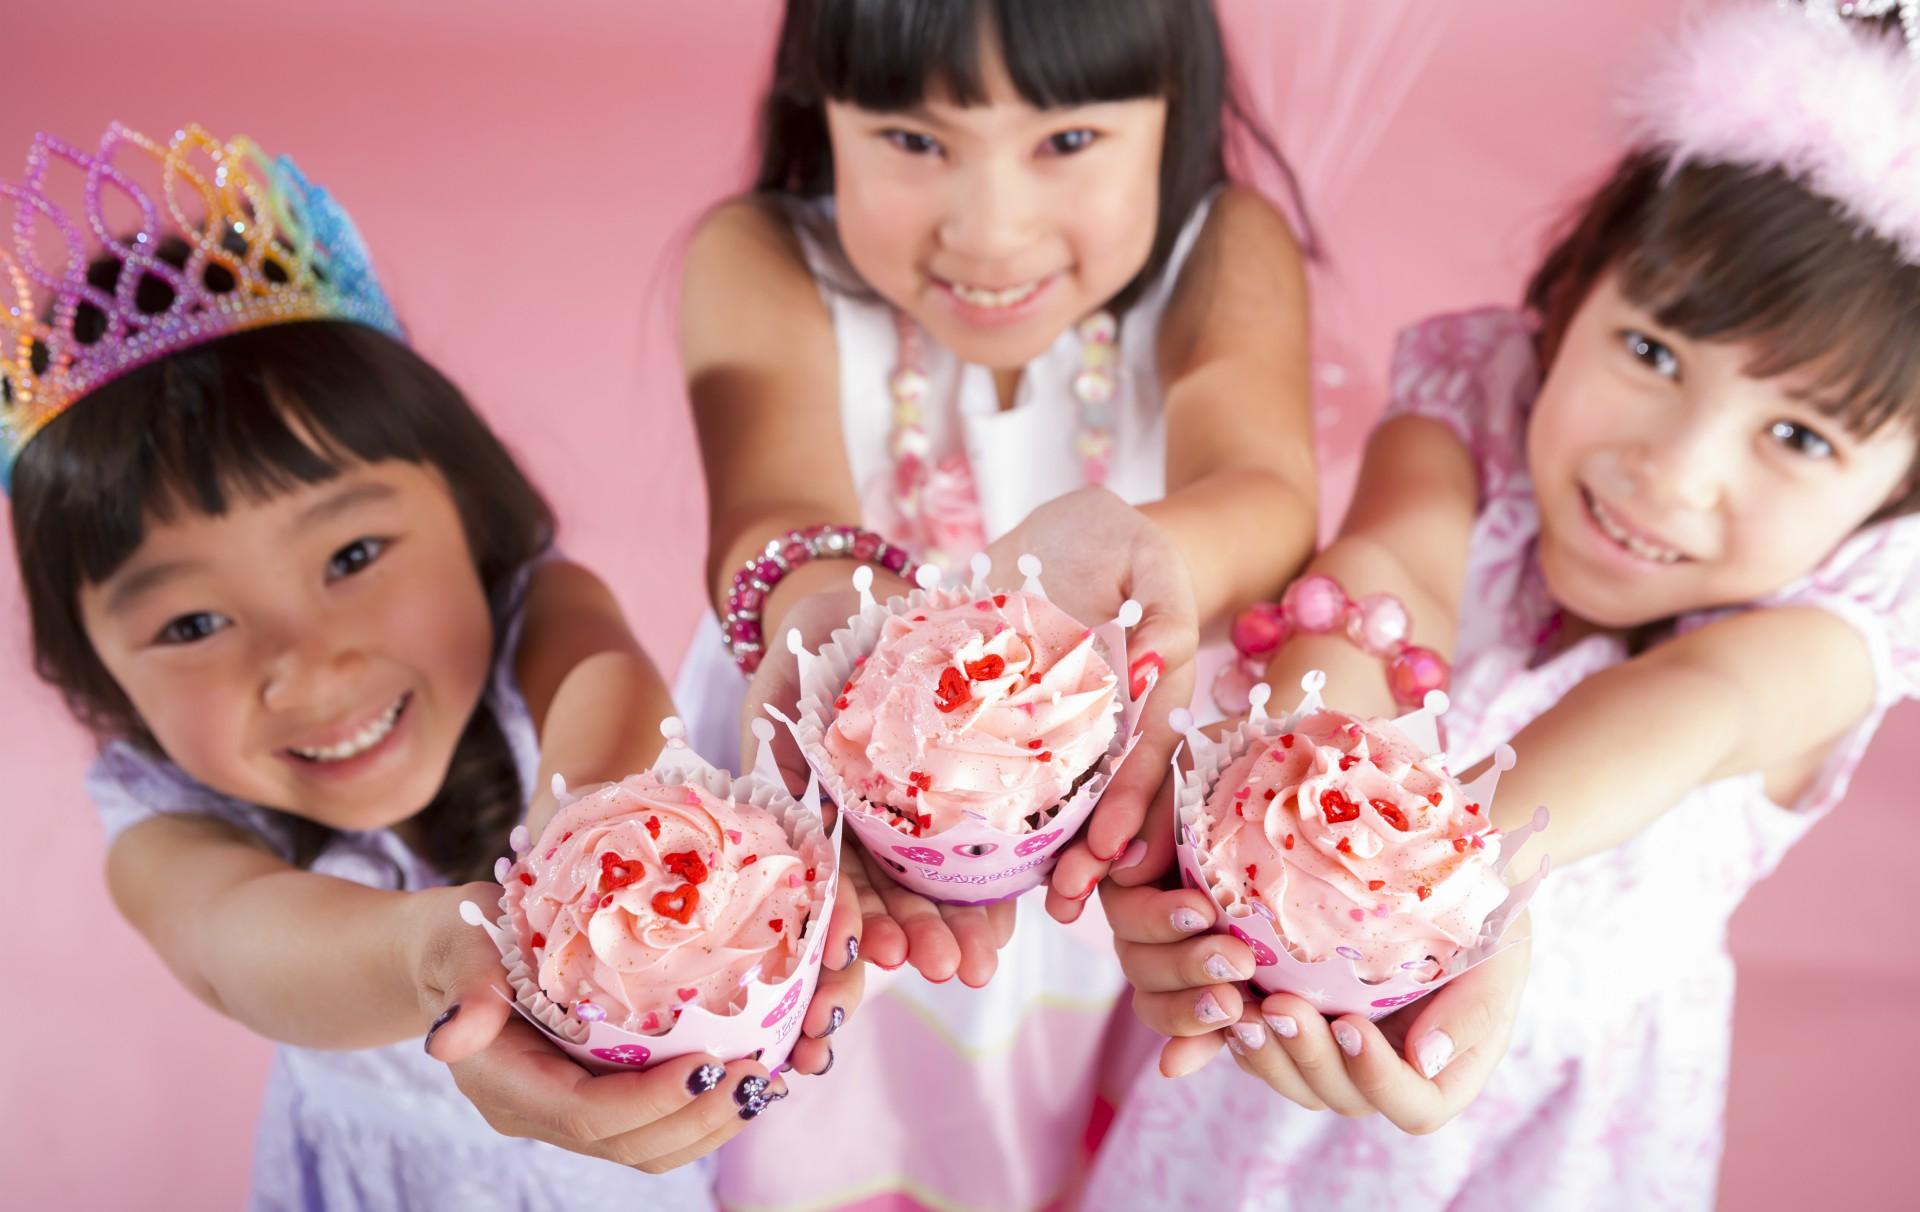 Astounding Disney Princess Cake Ideas Your Kids Will Go Crazy For Birthday Cards Printable Trancafe Filternl